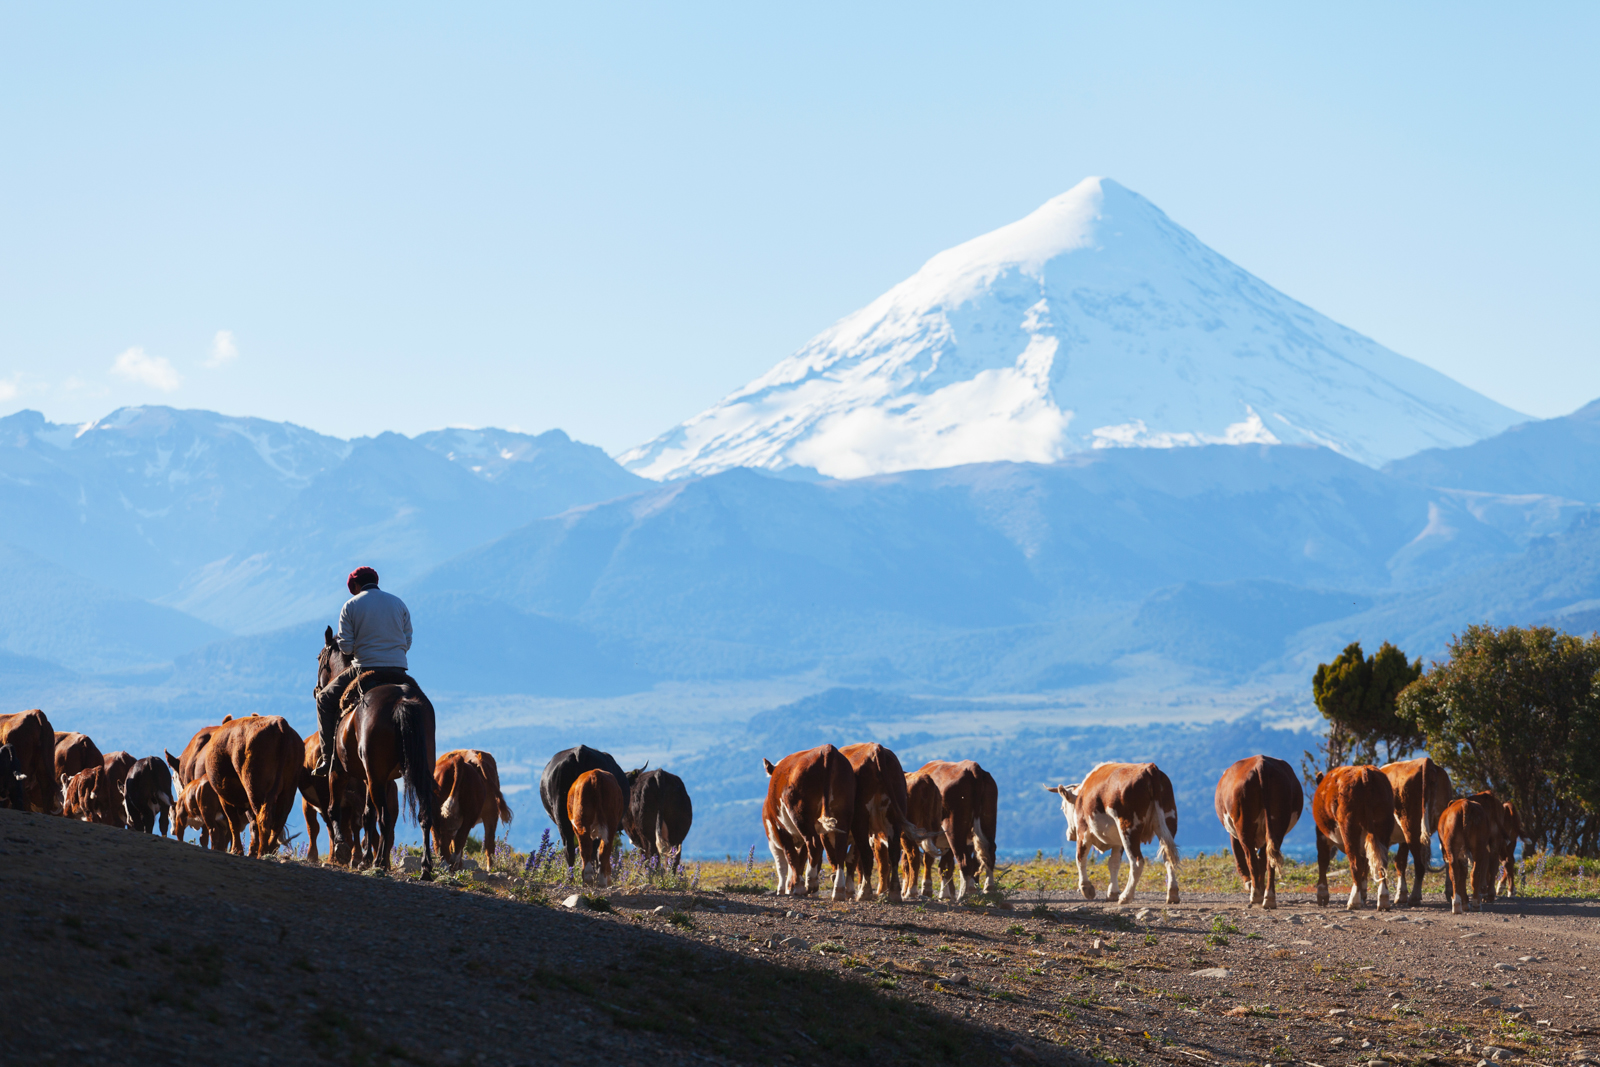 South America Chile - Travel Company